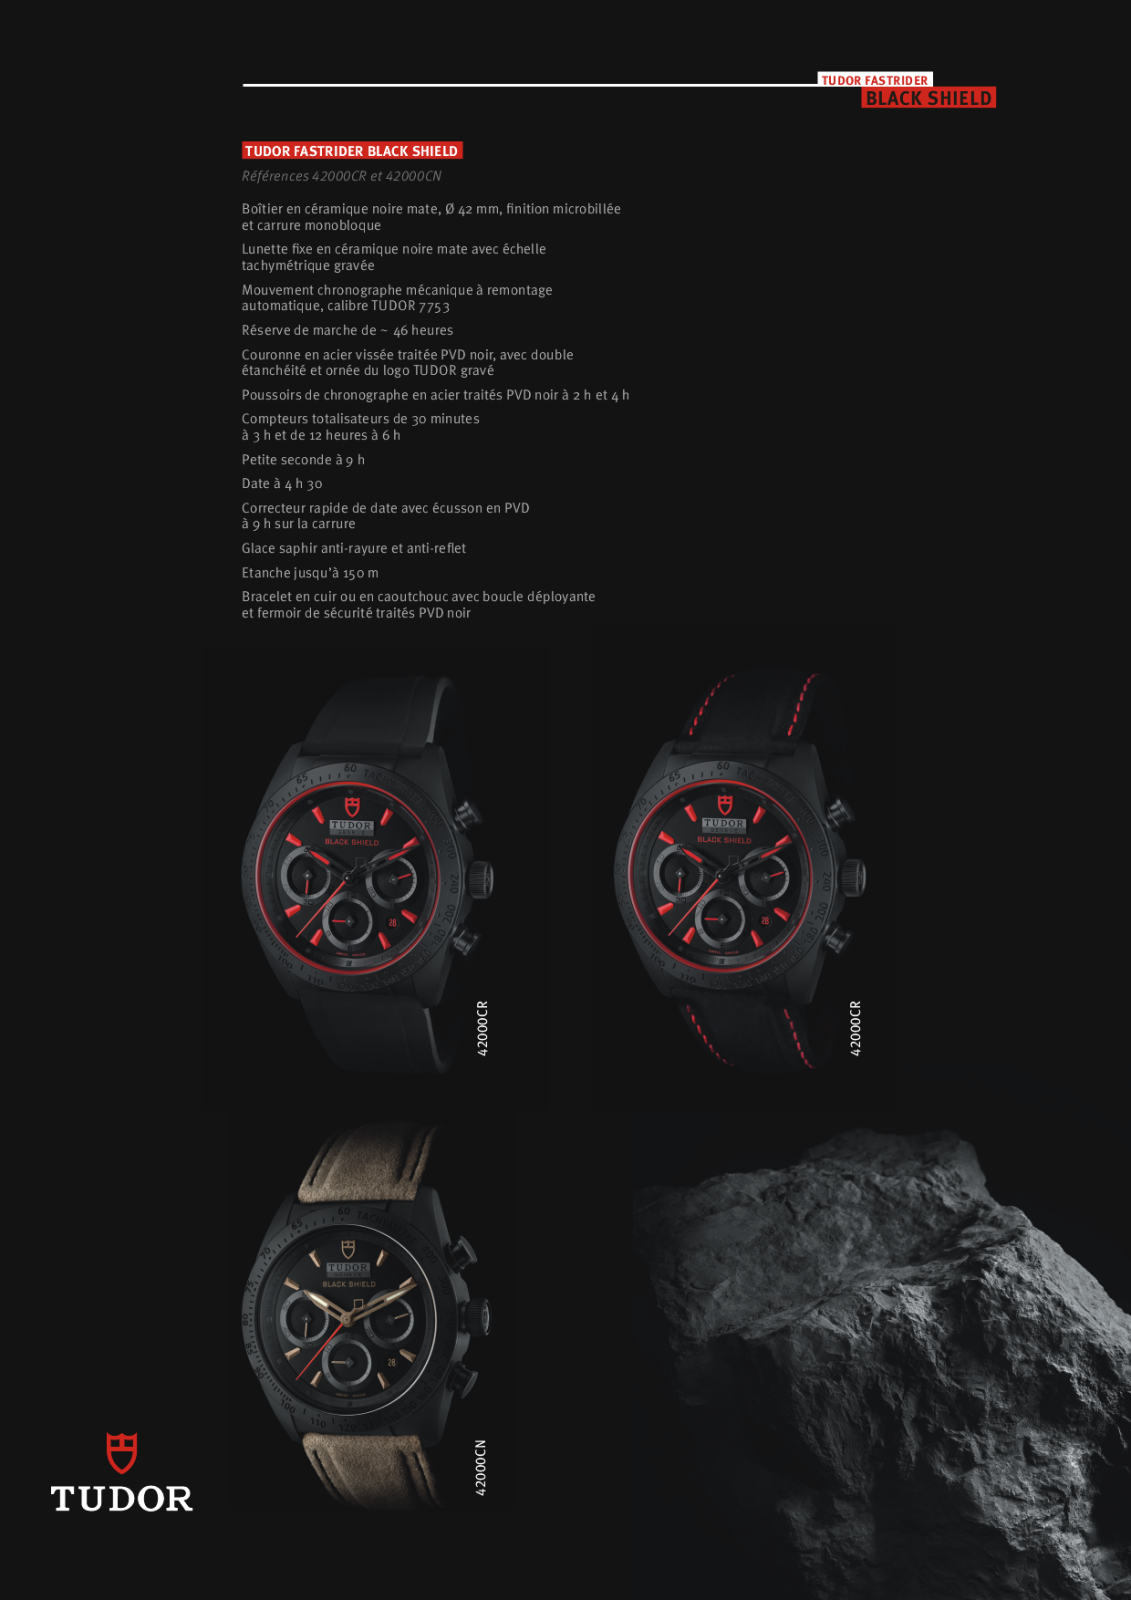 Baselworld 2013: Tudor - Black Shield 2ccoymh